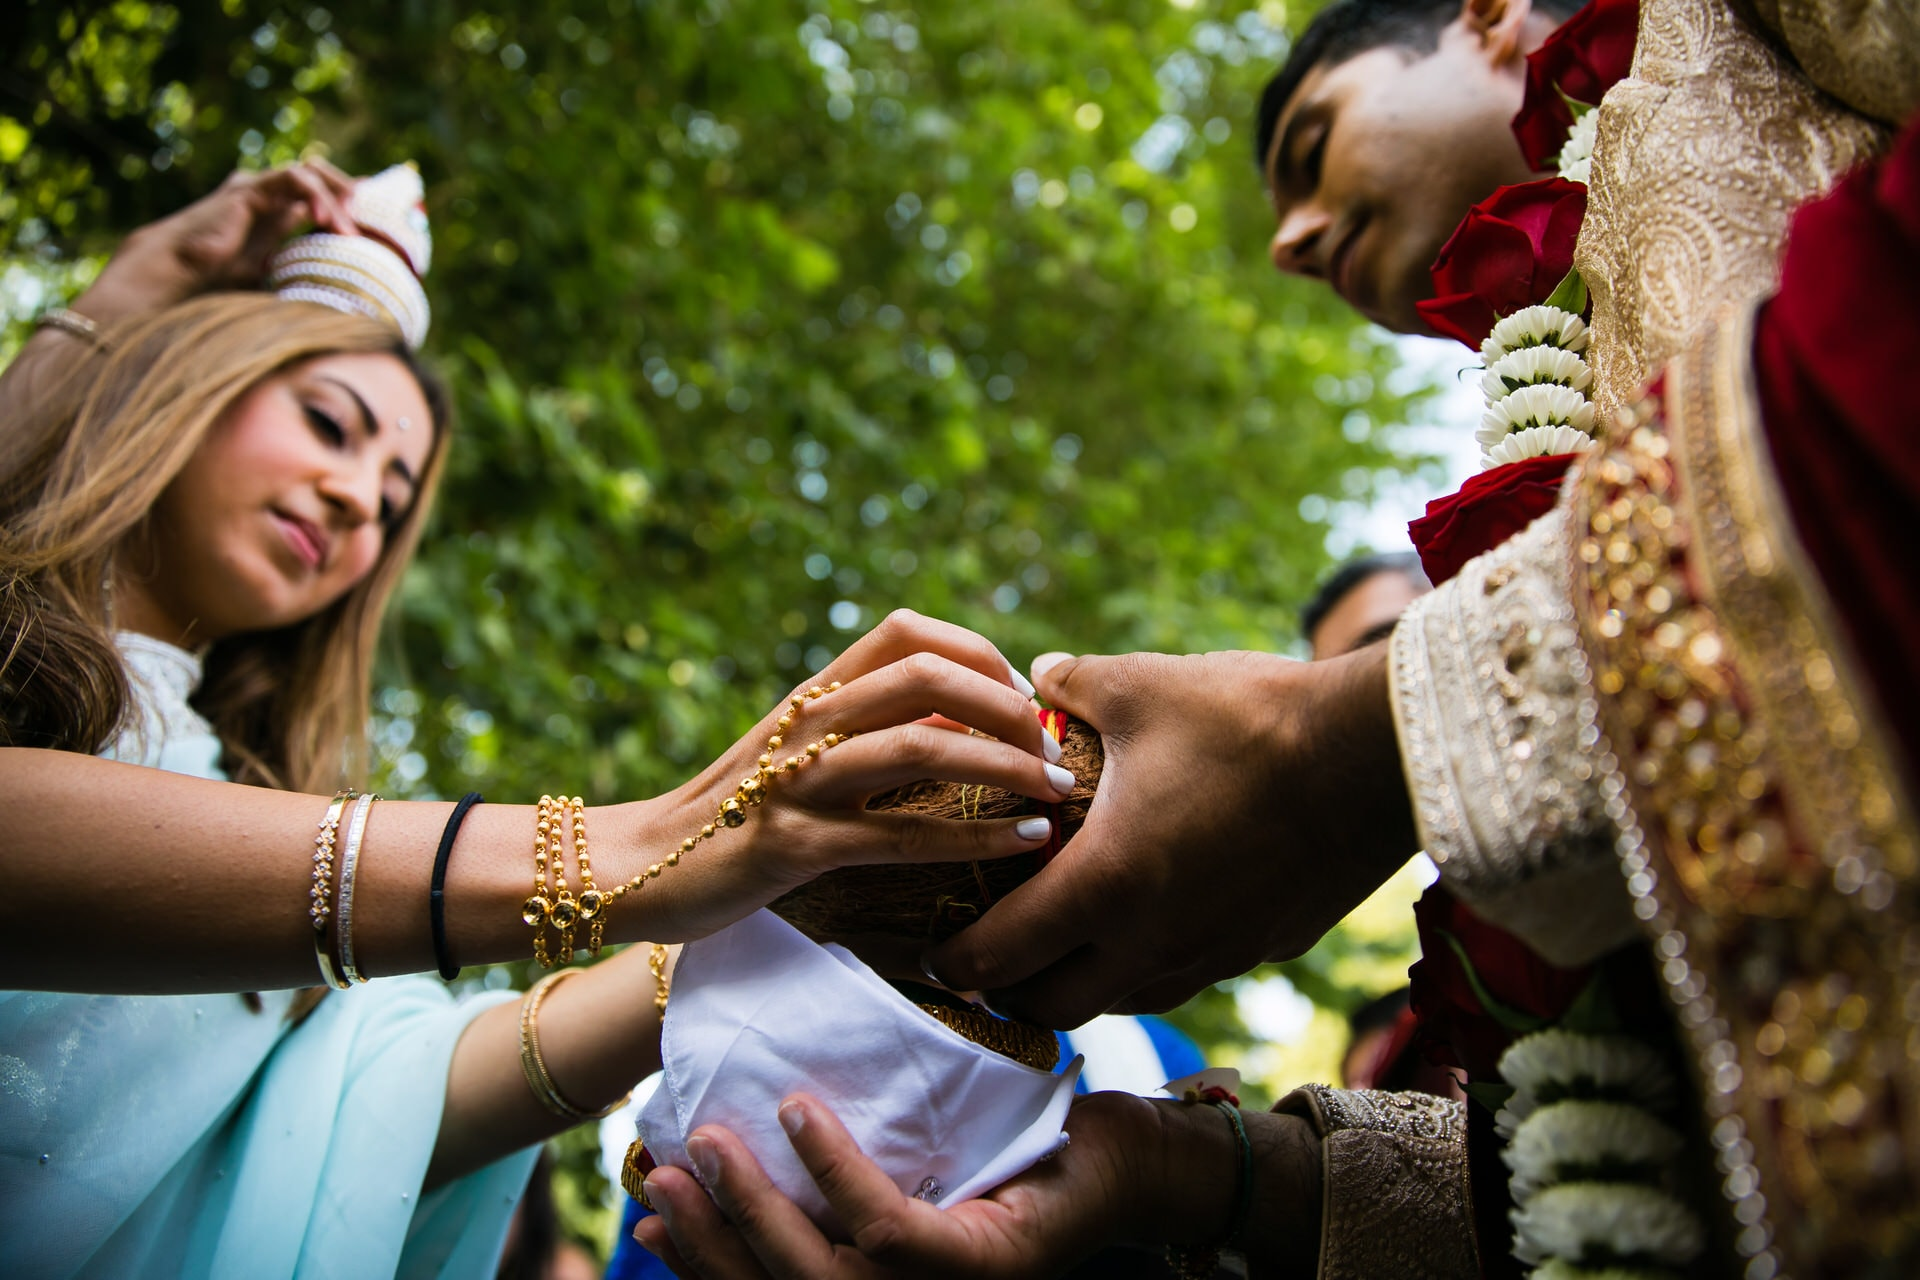 Coconut exchange ceremony during Hindu wedding